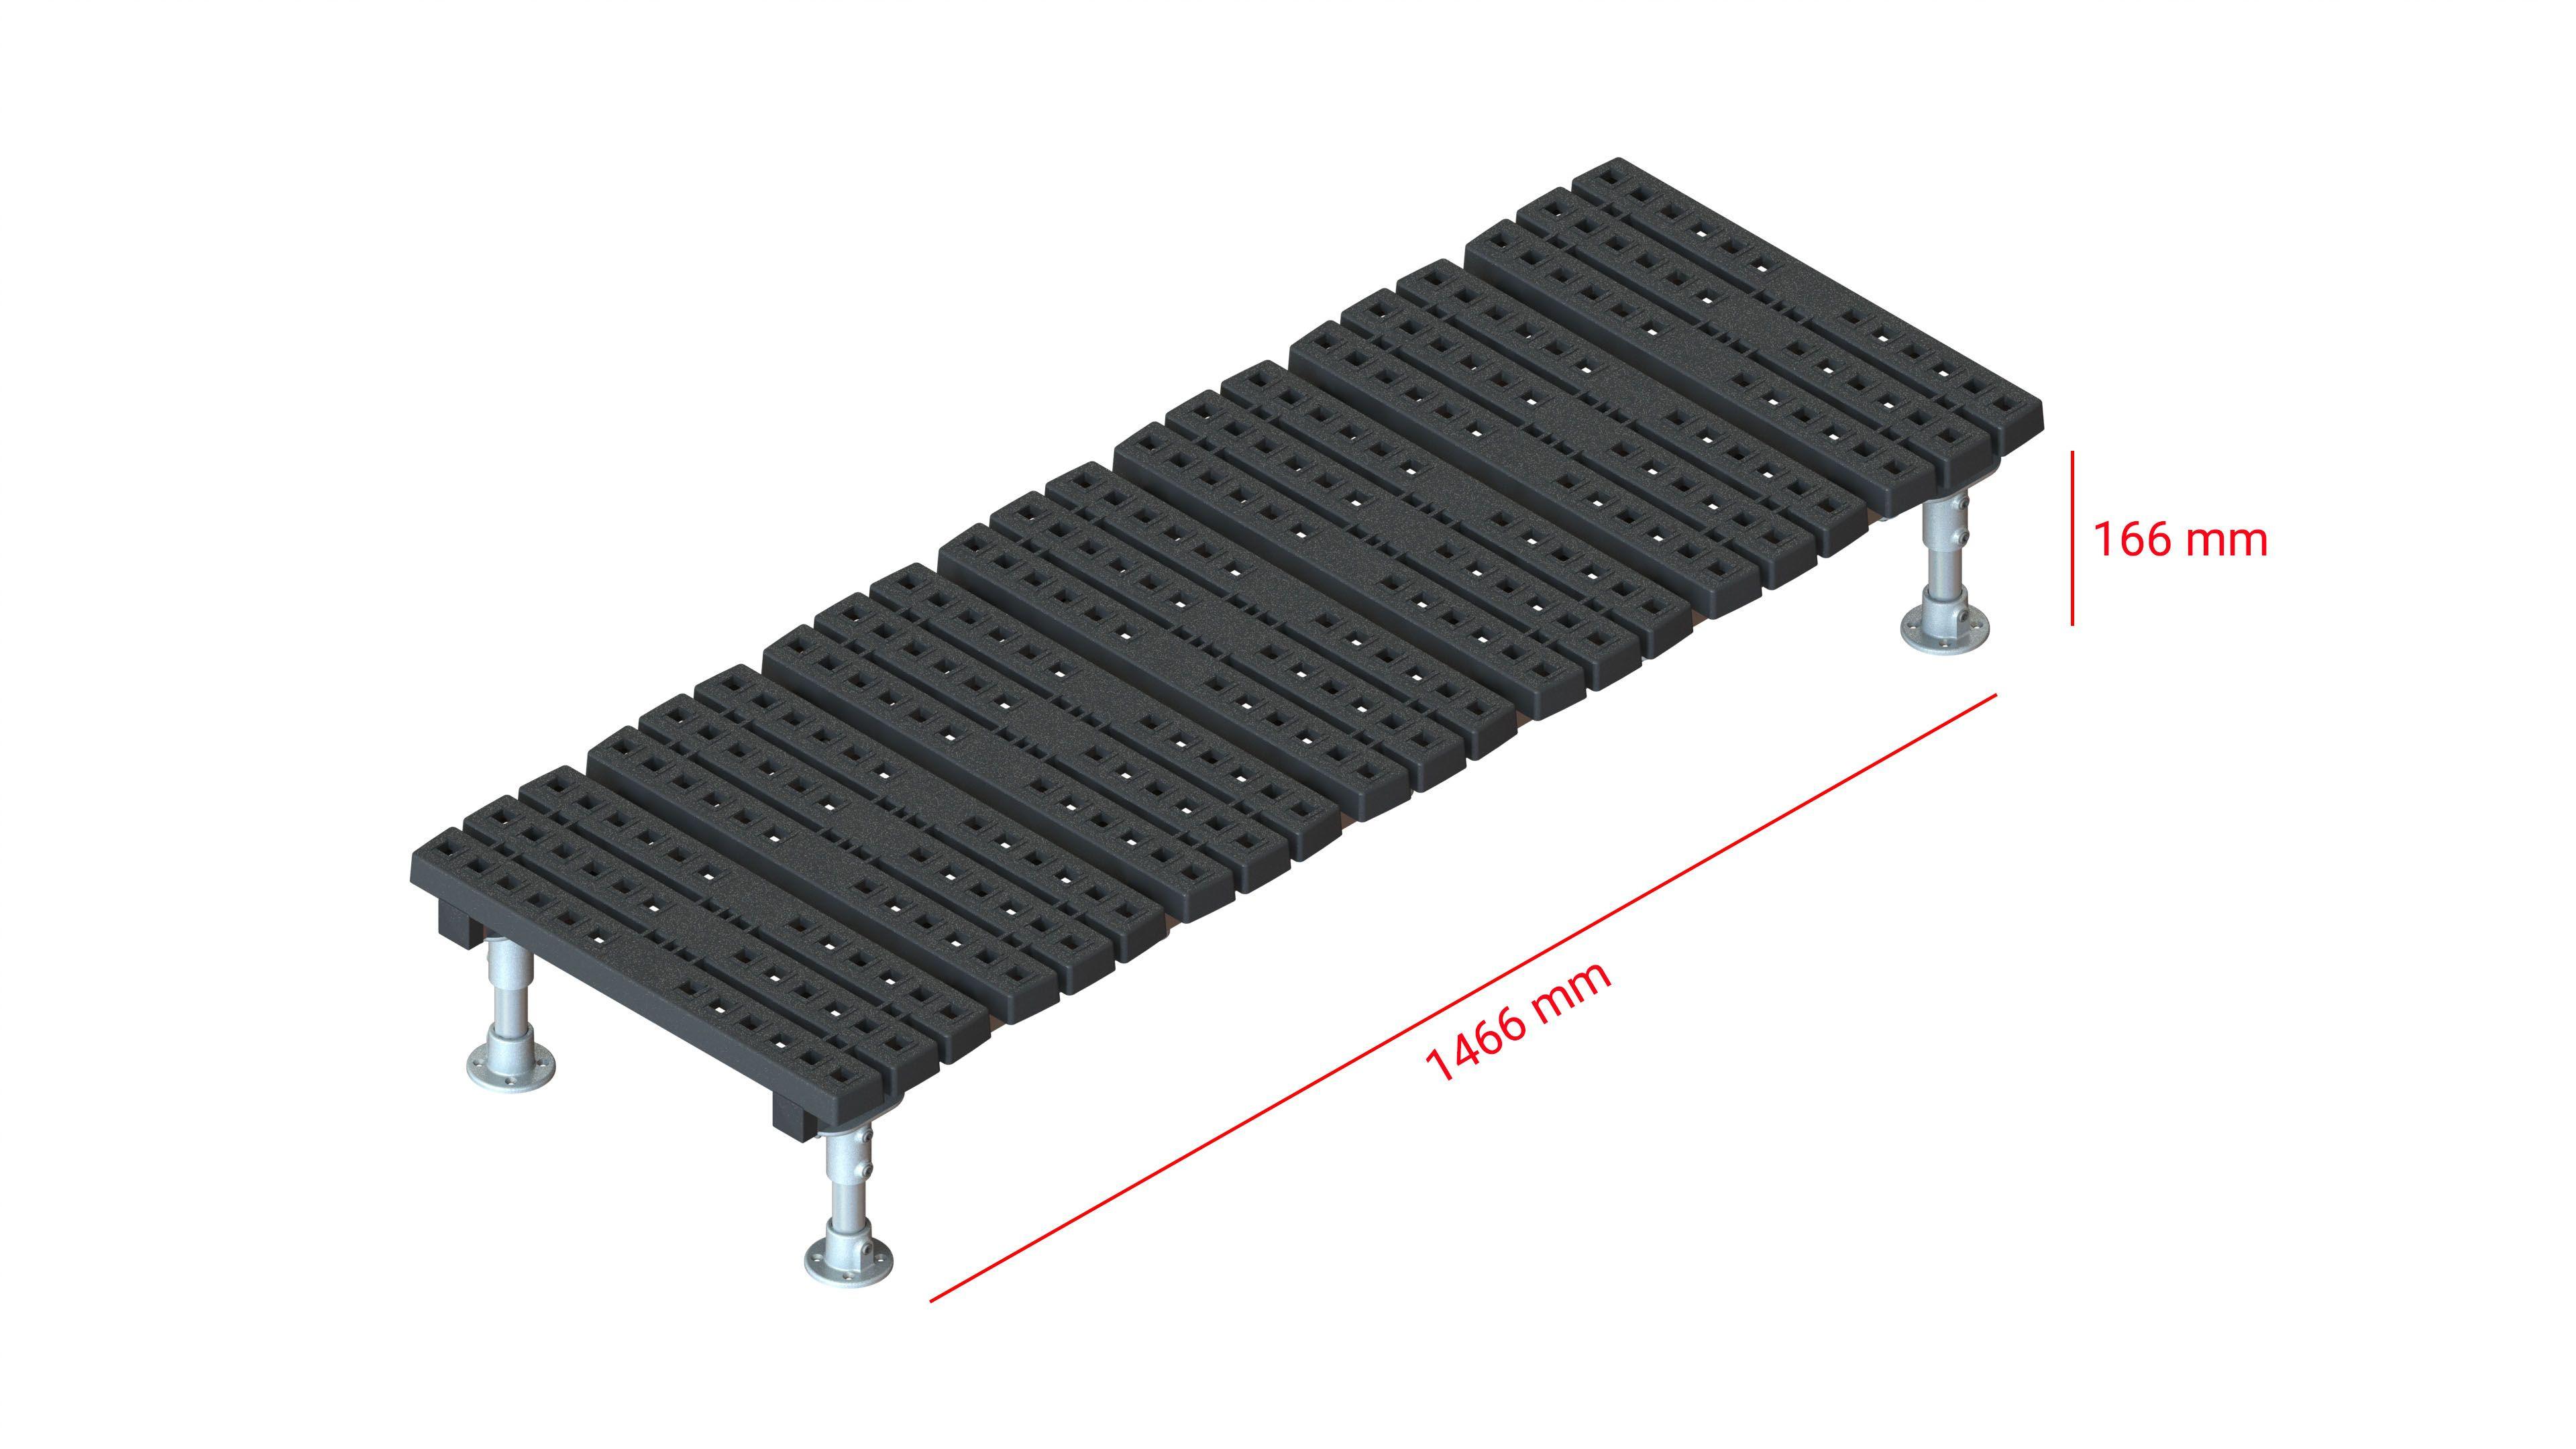 Mini step-over platform - Fixed, 166x1466mm clearance